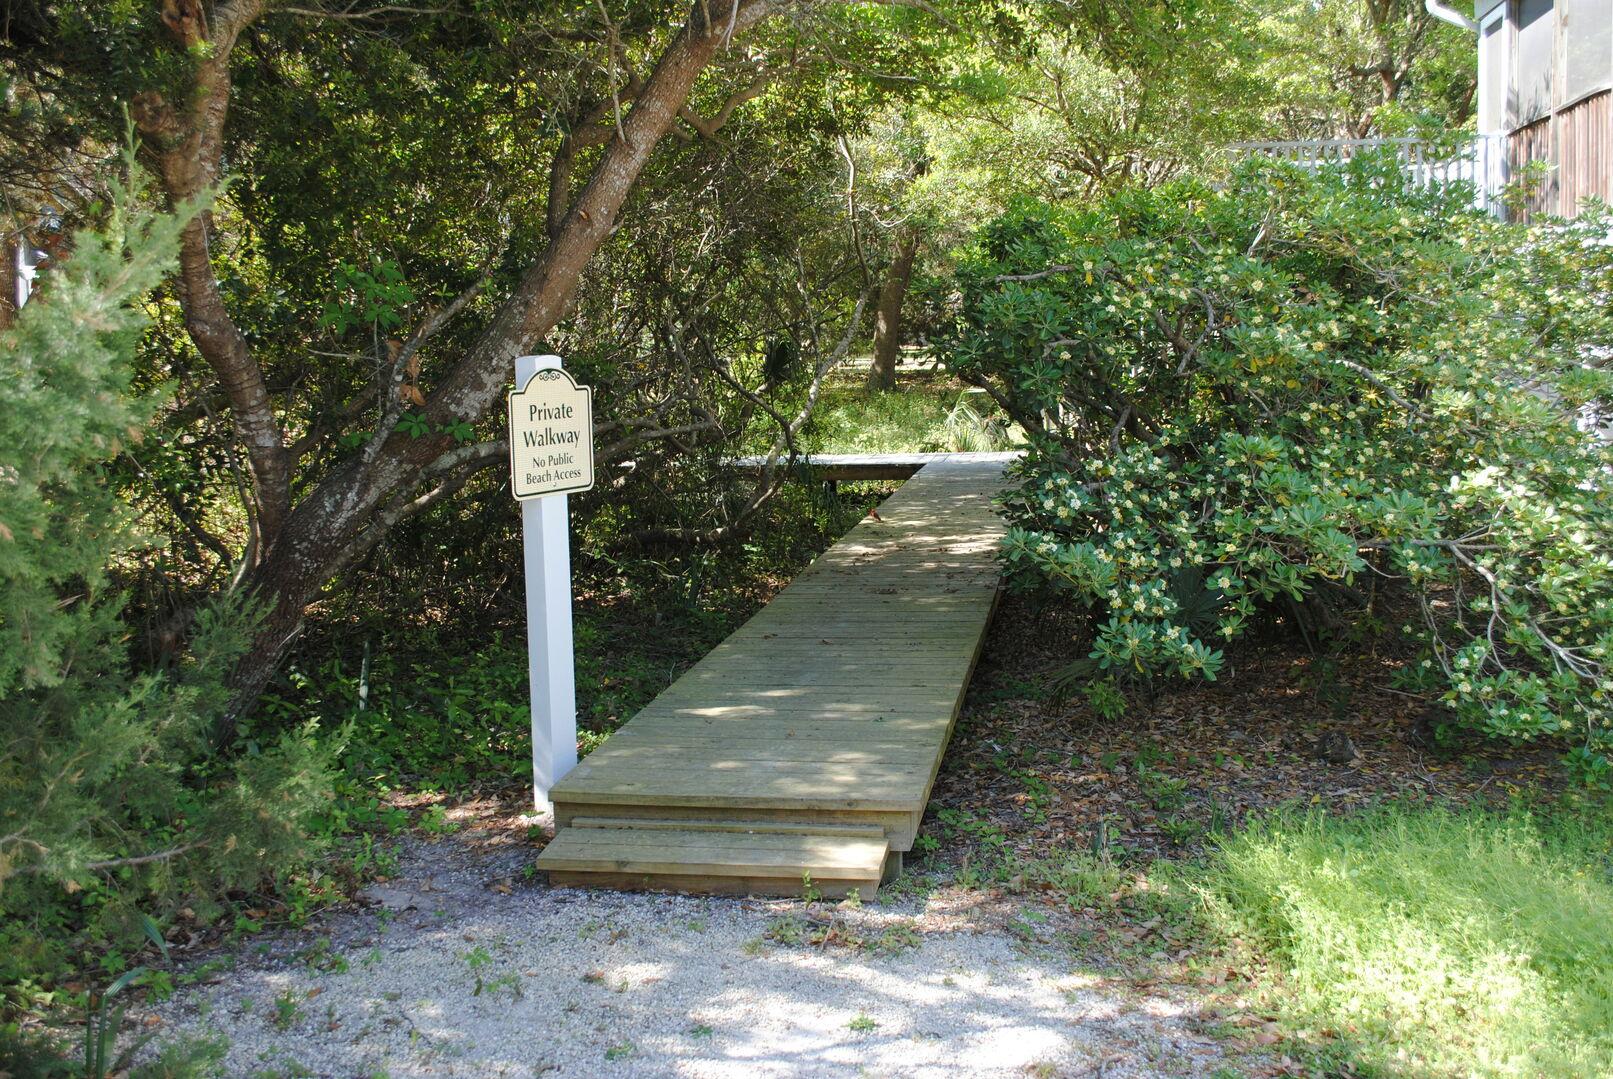 Private Walkway to Beach (Shared)